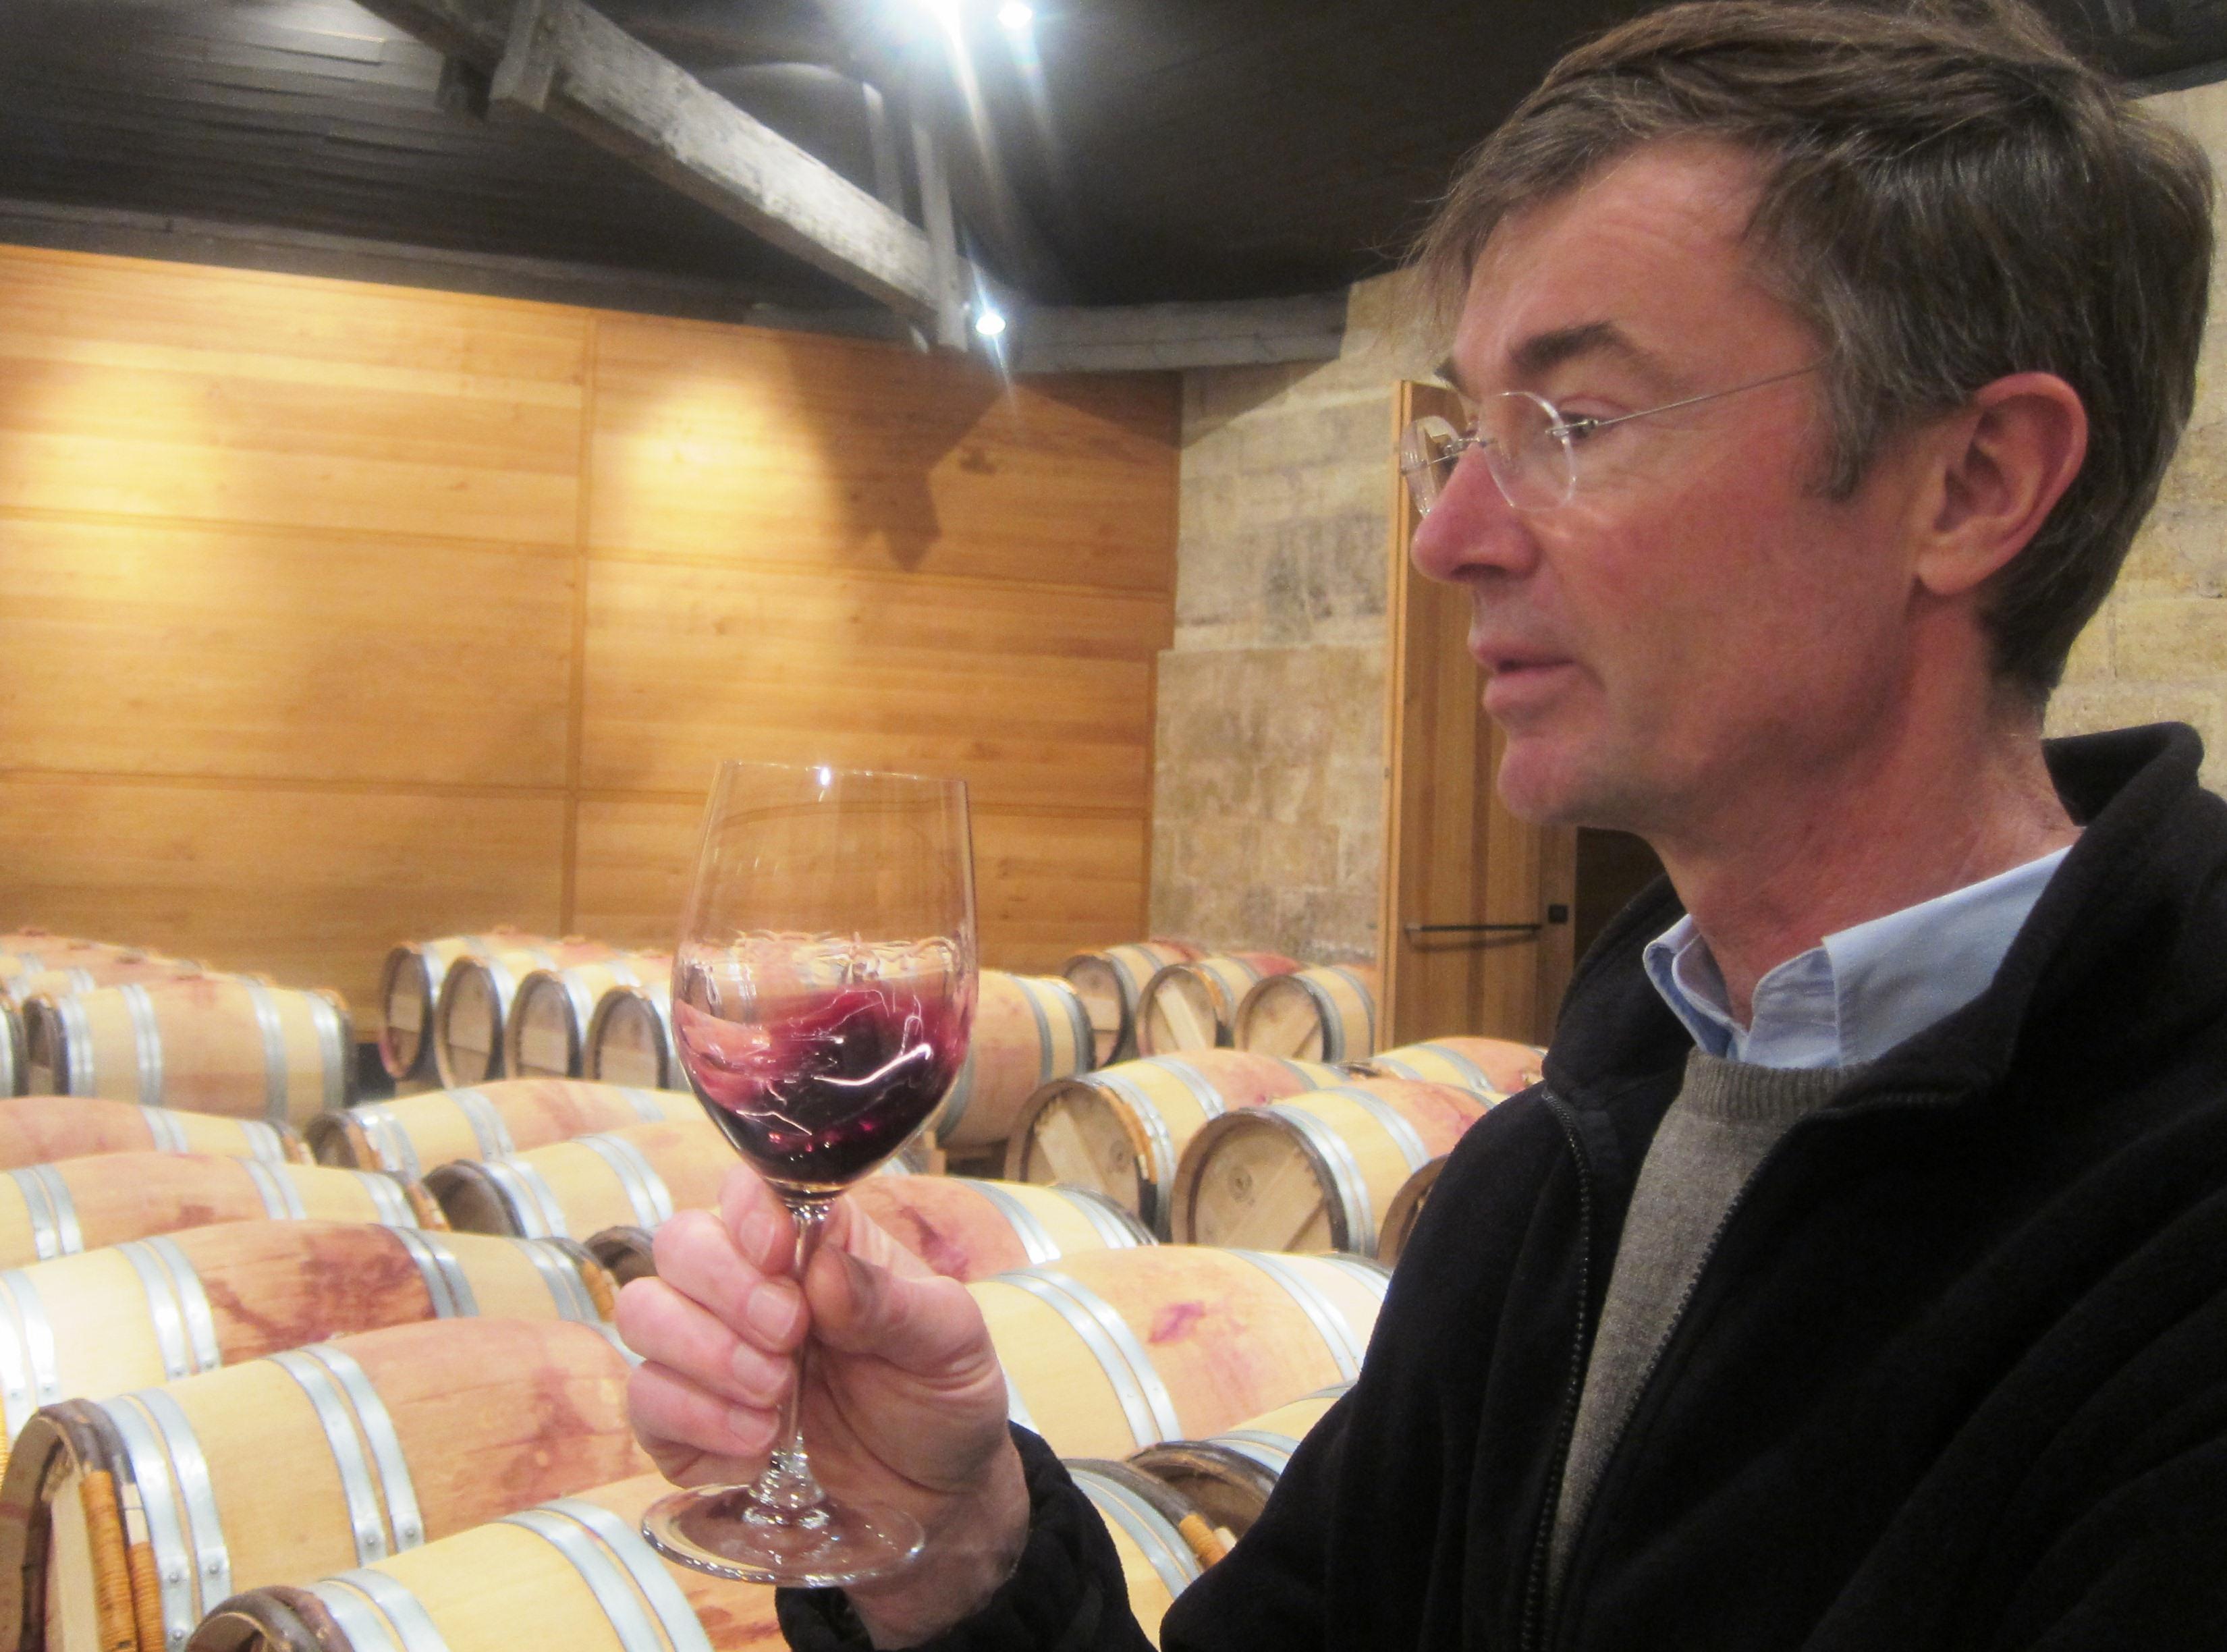 2010 Vieux Chateau Certan pomerol wine